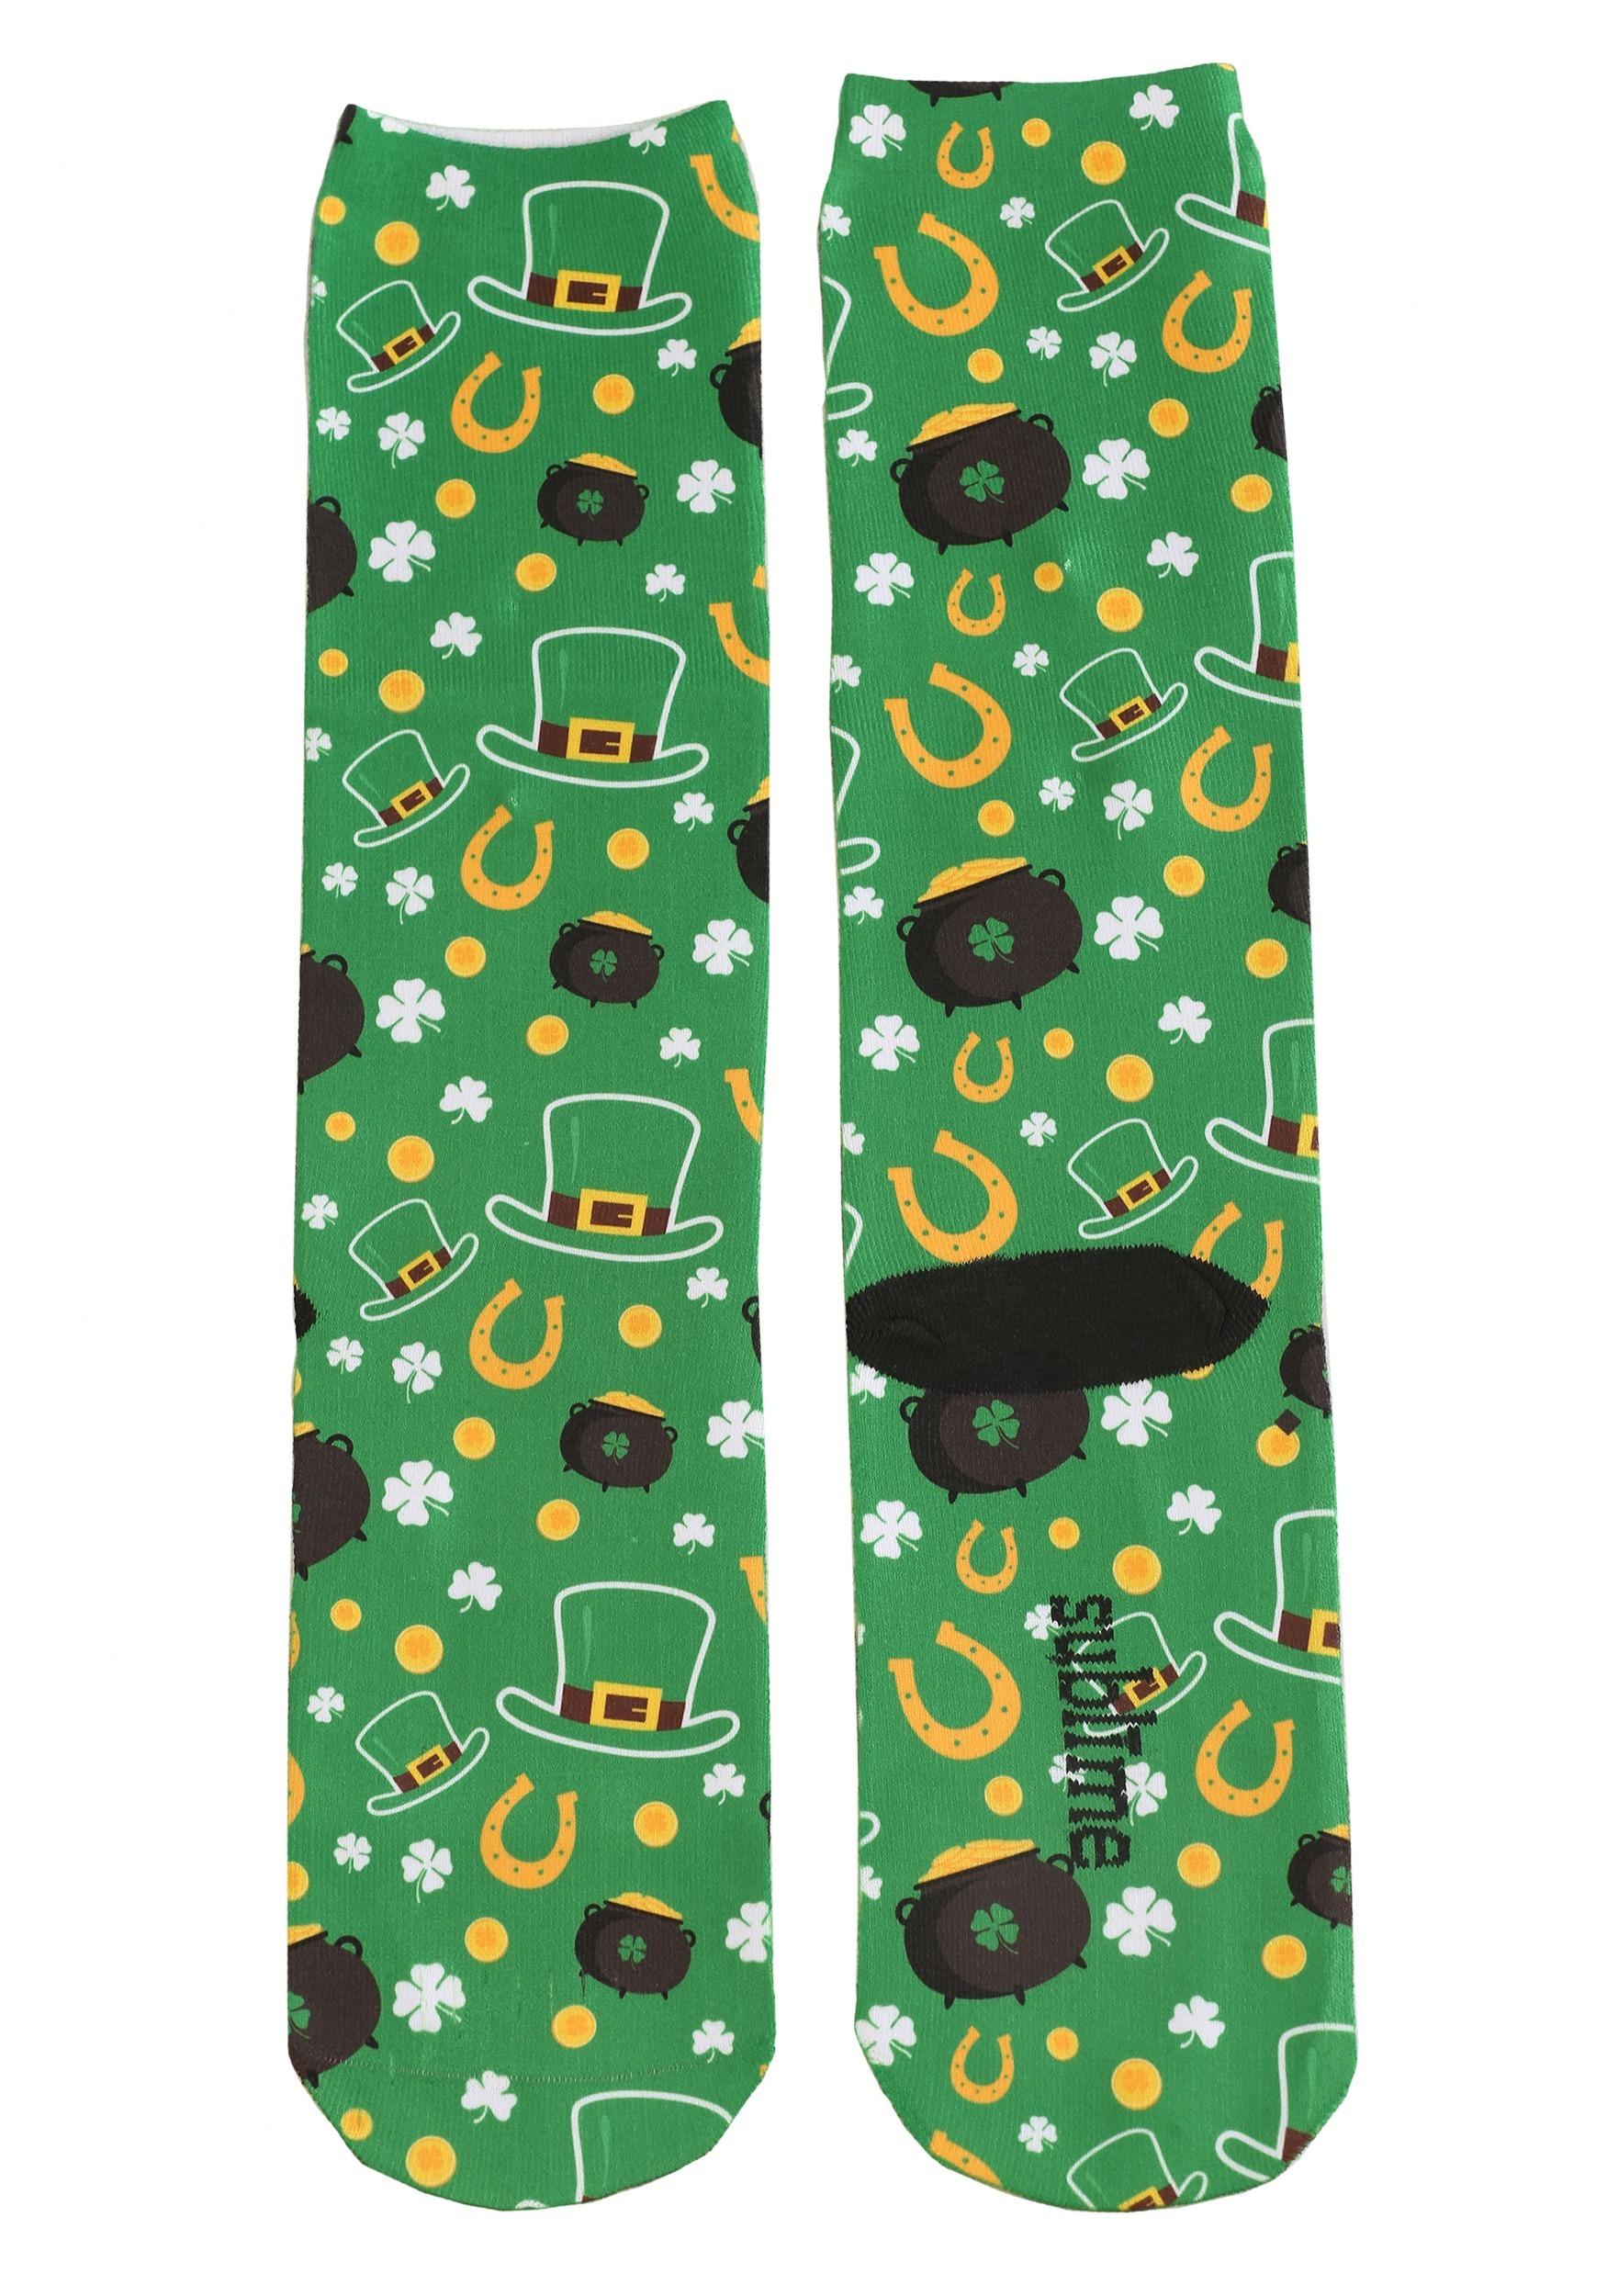 89fc514d8 Adult Saint Patrick s Day All Over Print Knee-High Socks